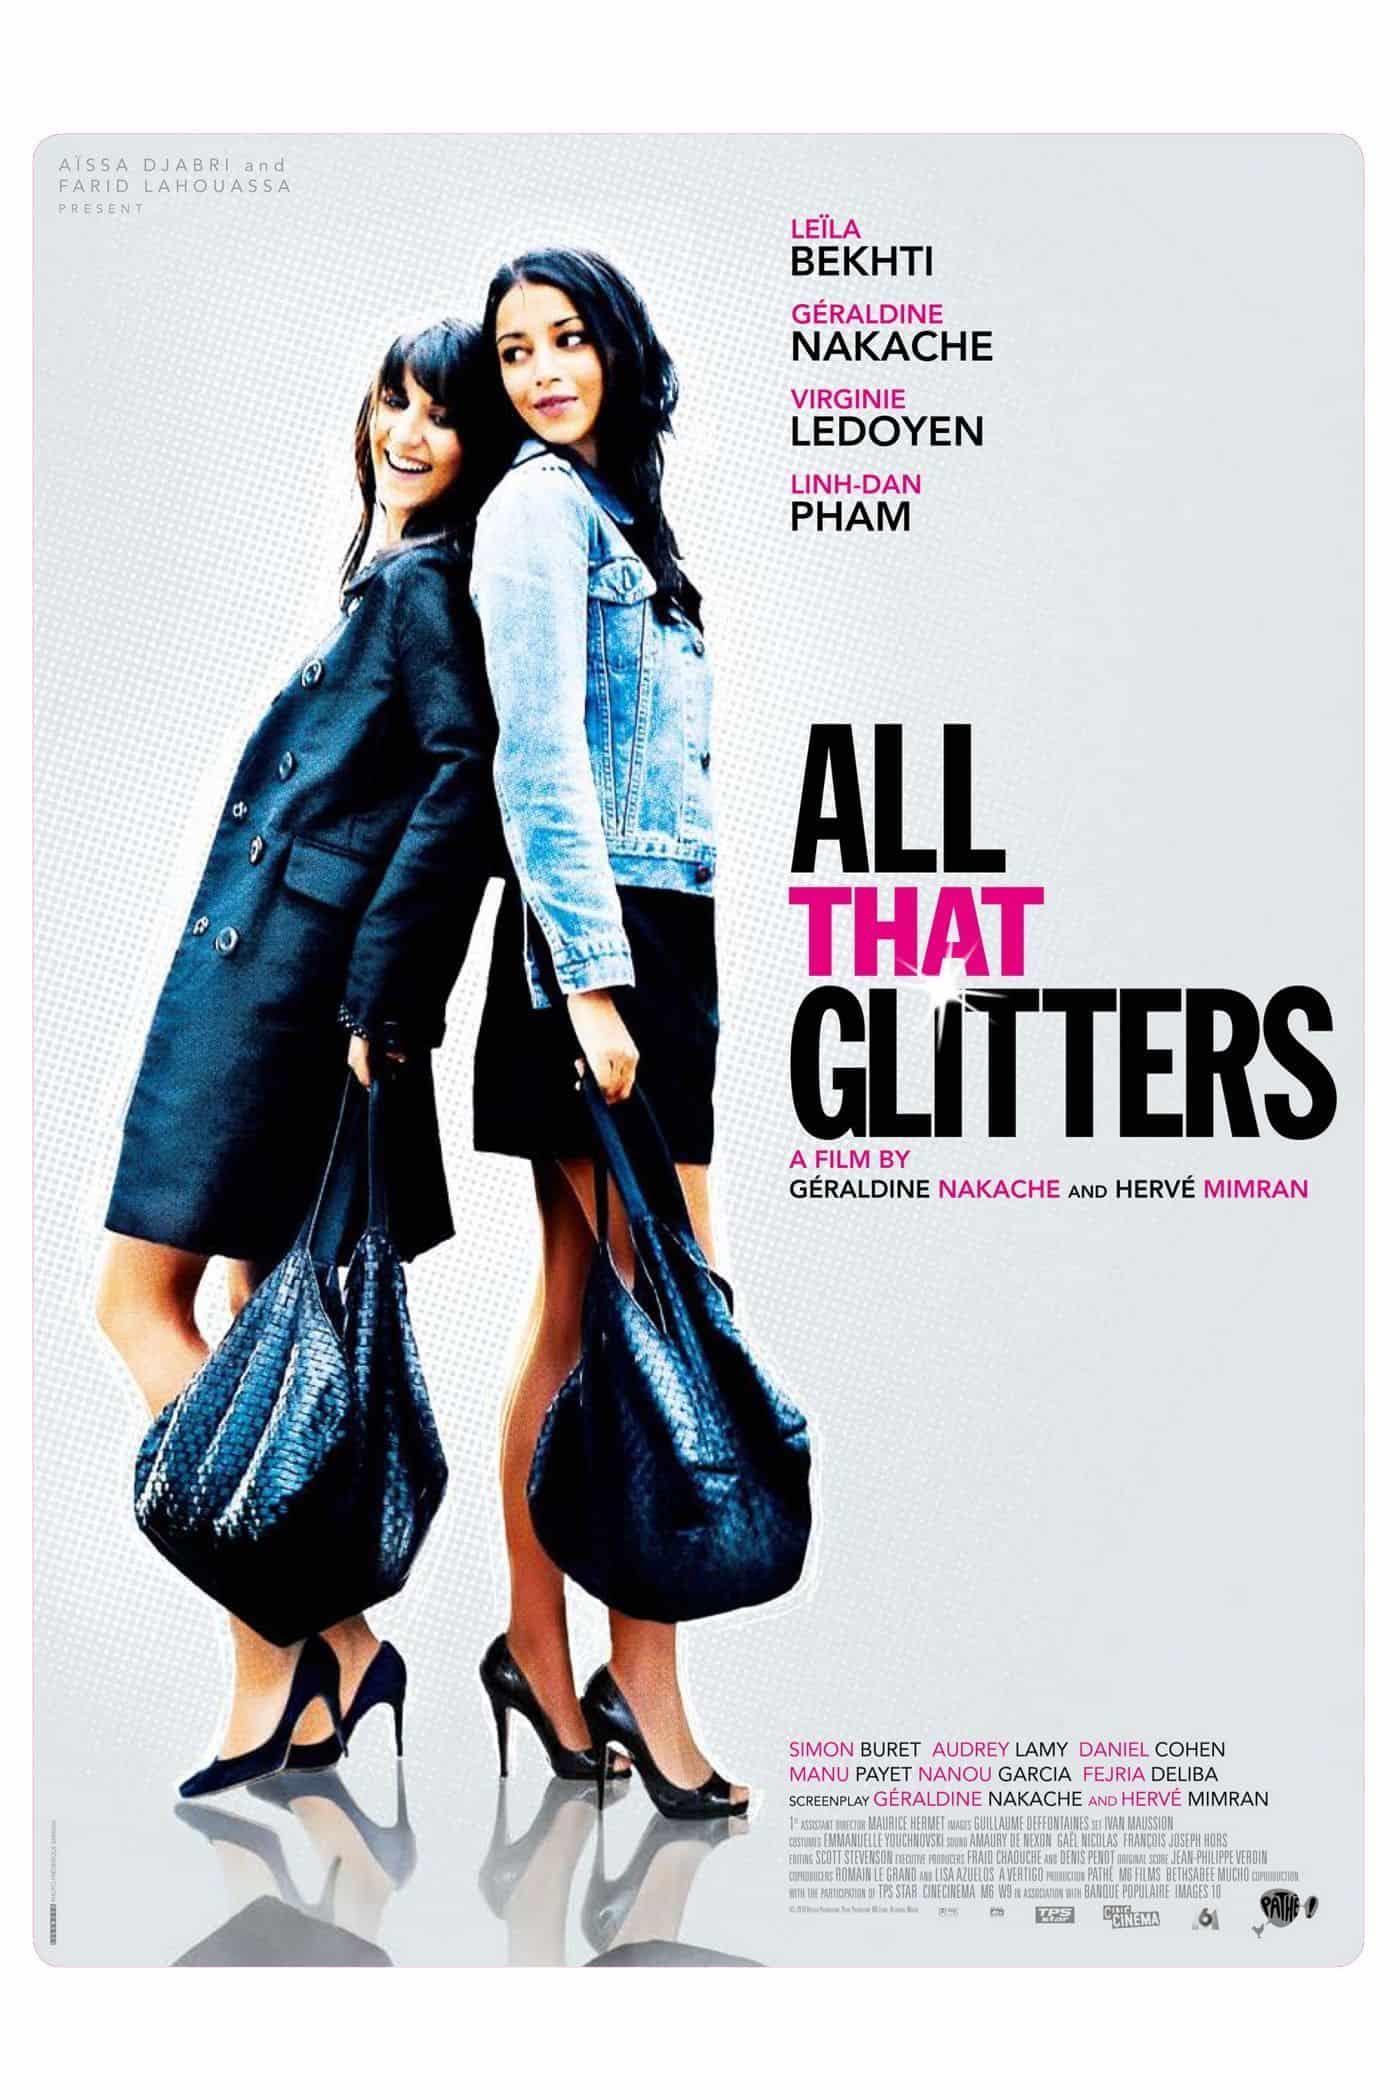 All That Glitters, 2010